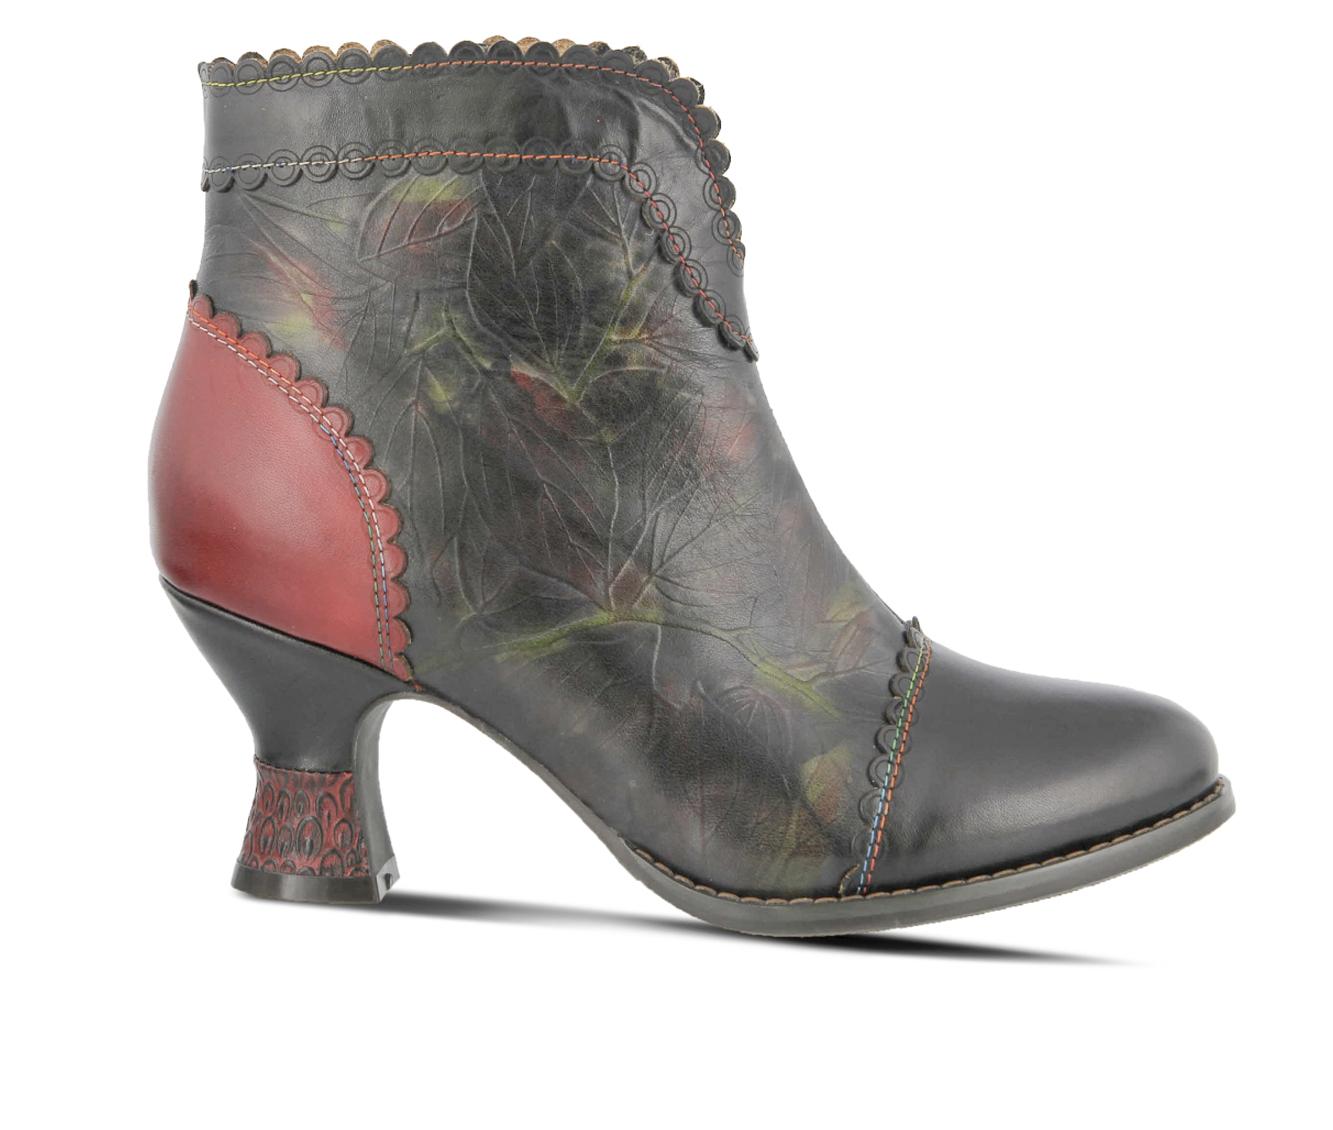 L'Artiste Leafeel Women's Boots (Black Leather)